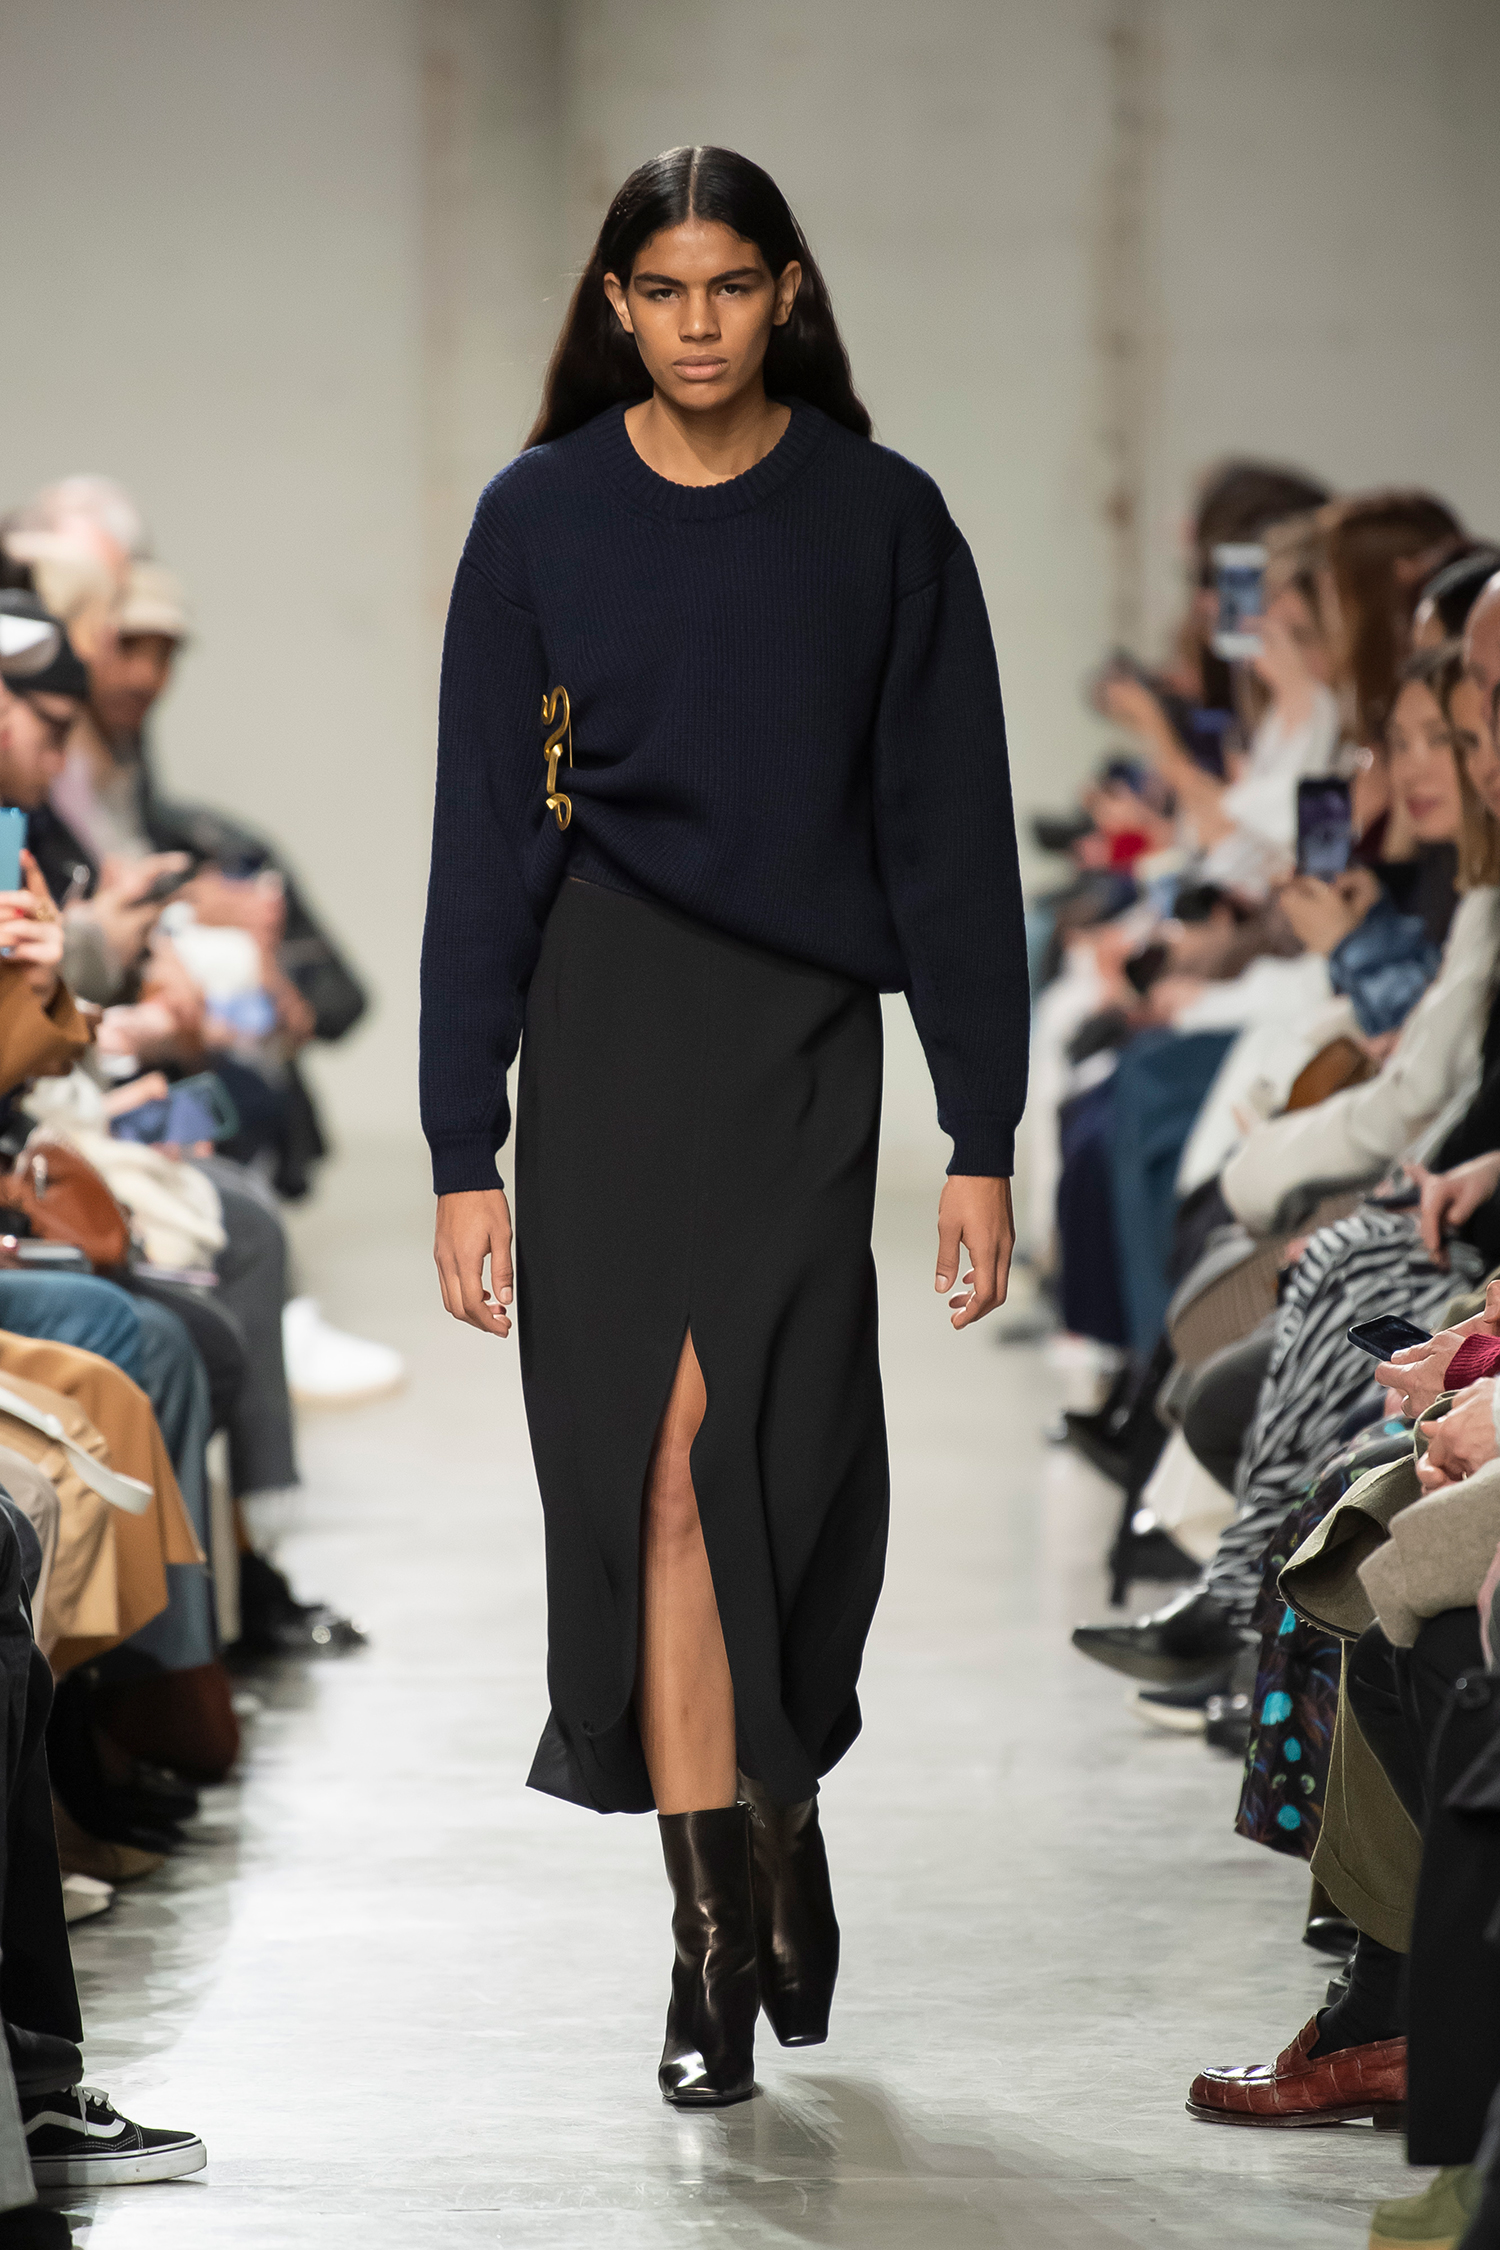 LOOK 21 Knitwear RIYA Skirt RIHAM